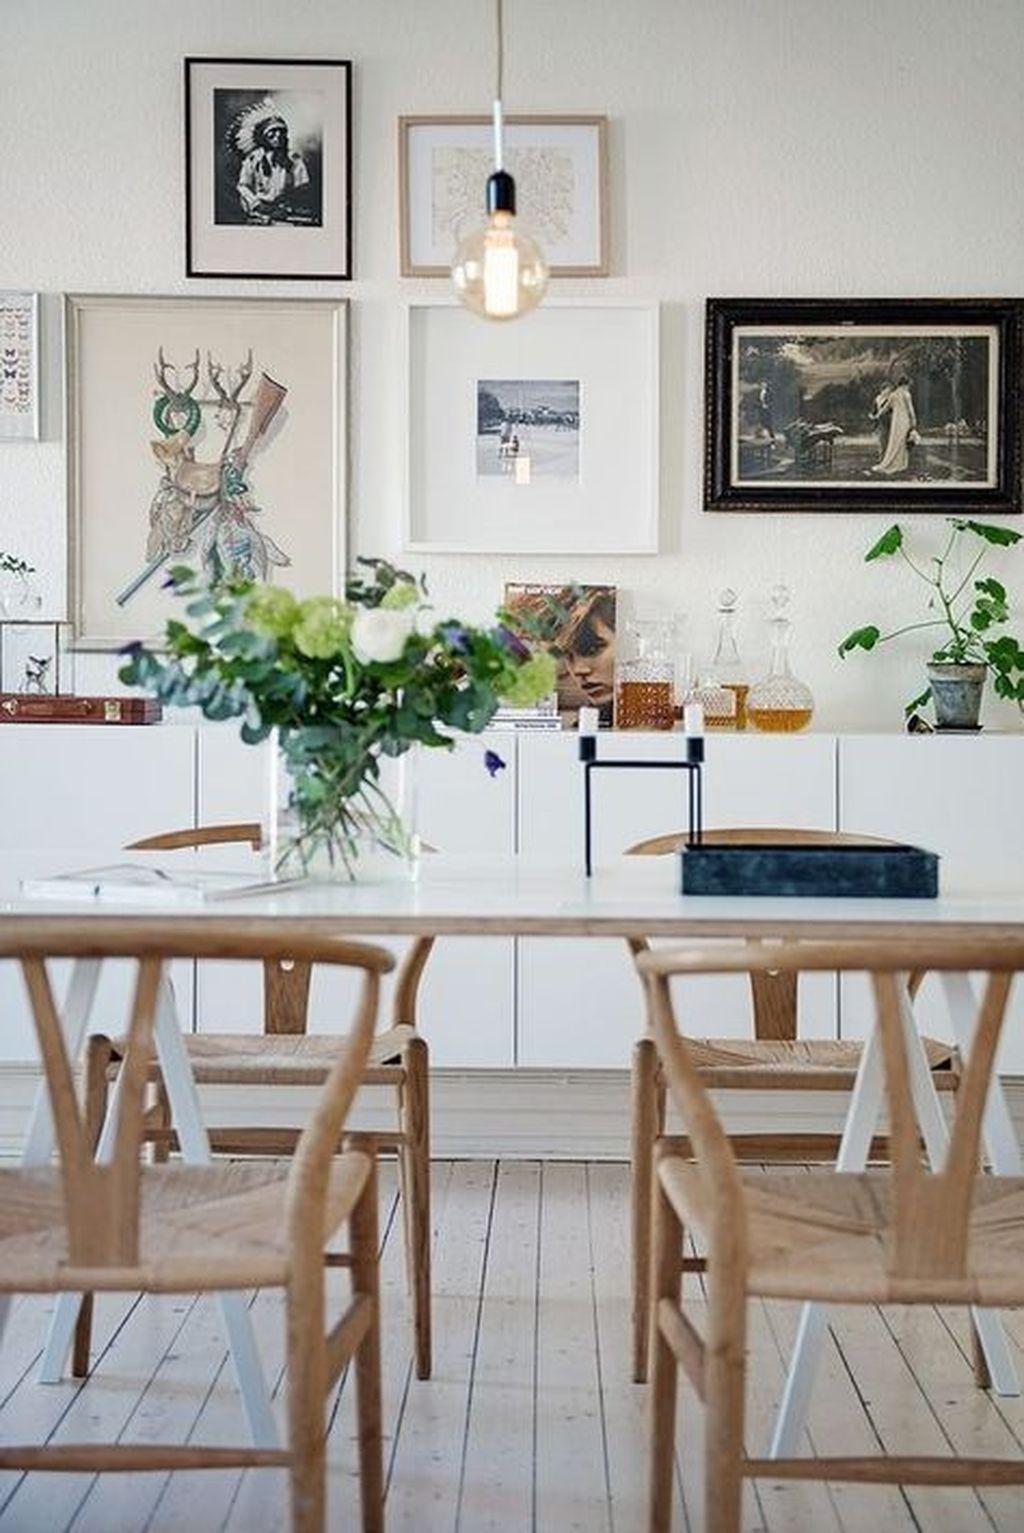 50 Simple Scandinavian Dining Room Ideas  Room Ideas Gallery New Scandinavian Dining Room Inspiration Design